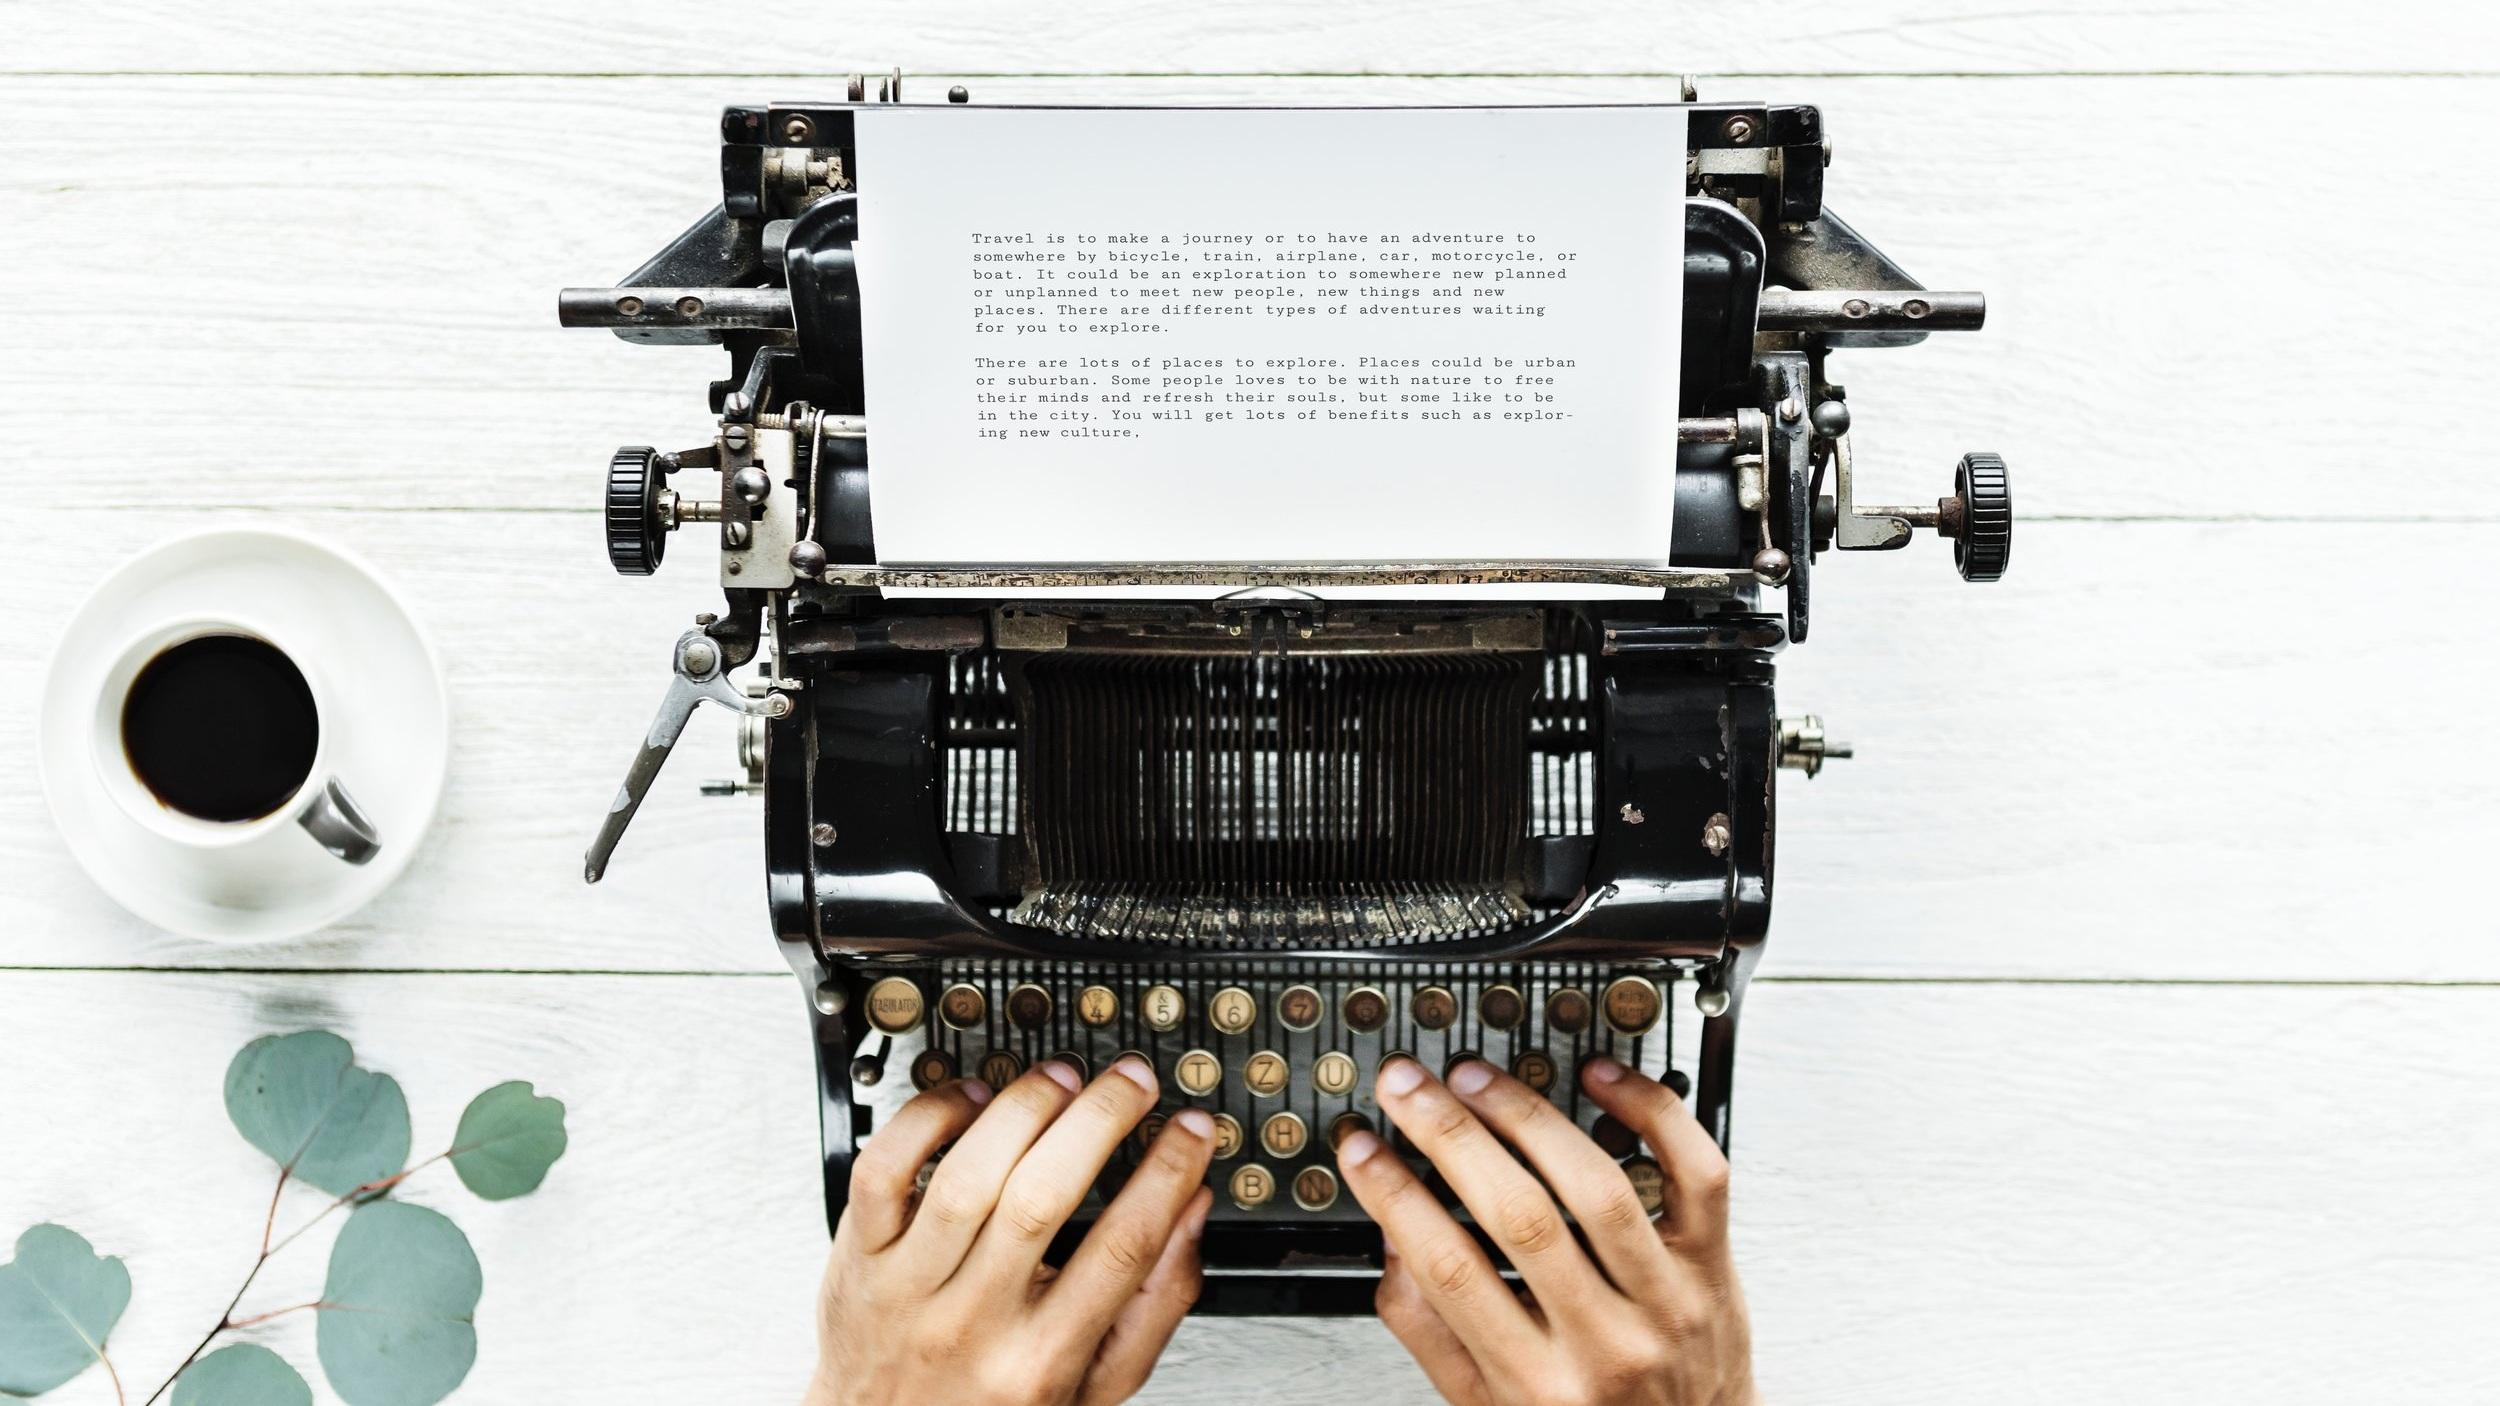 CONTENU - Peut-on dupliquer du contenu ?